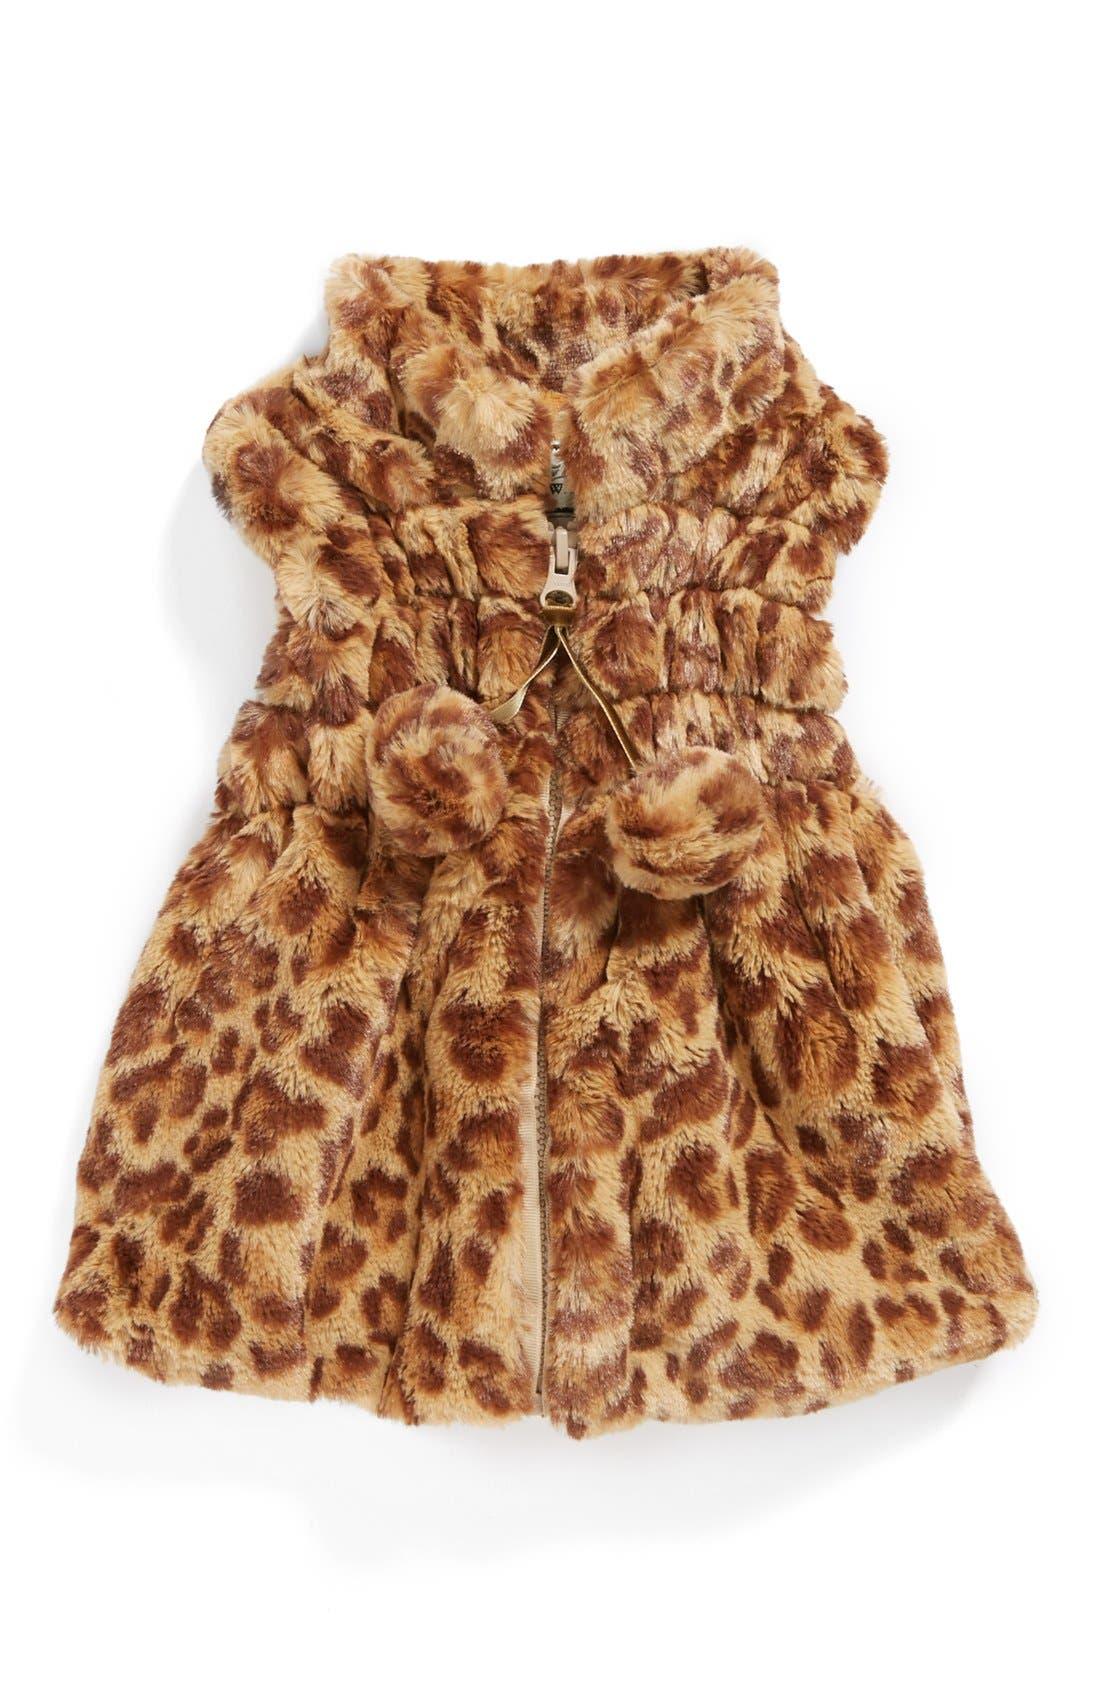 Alternate Image 1 Selected - Widgeon Faux Fur Vest (Baby Girls)